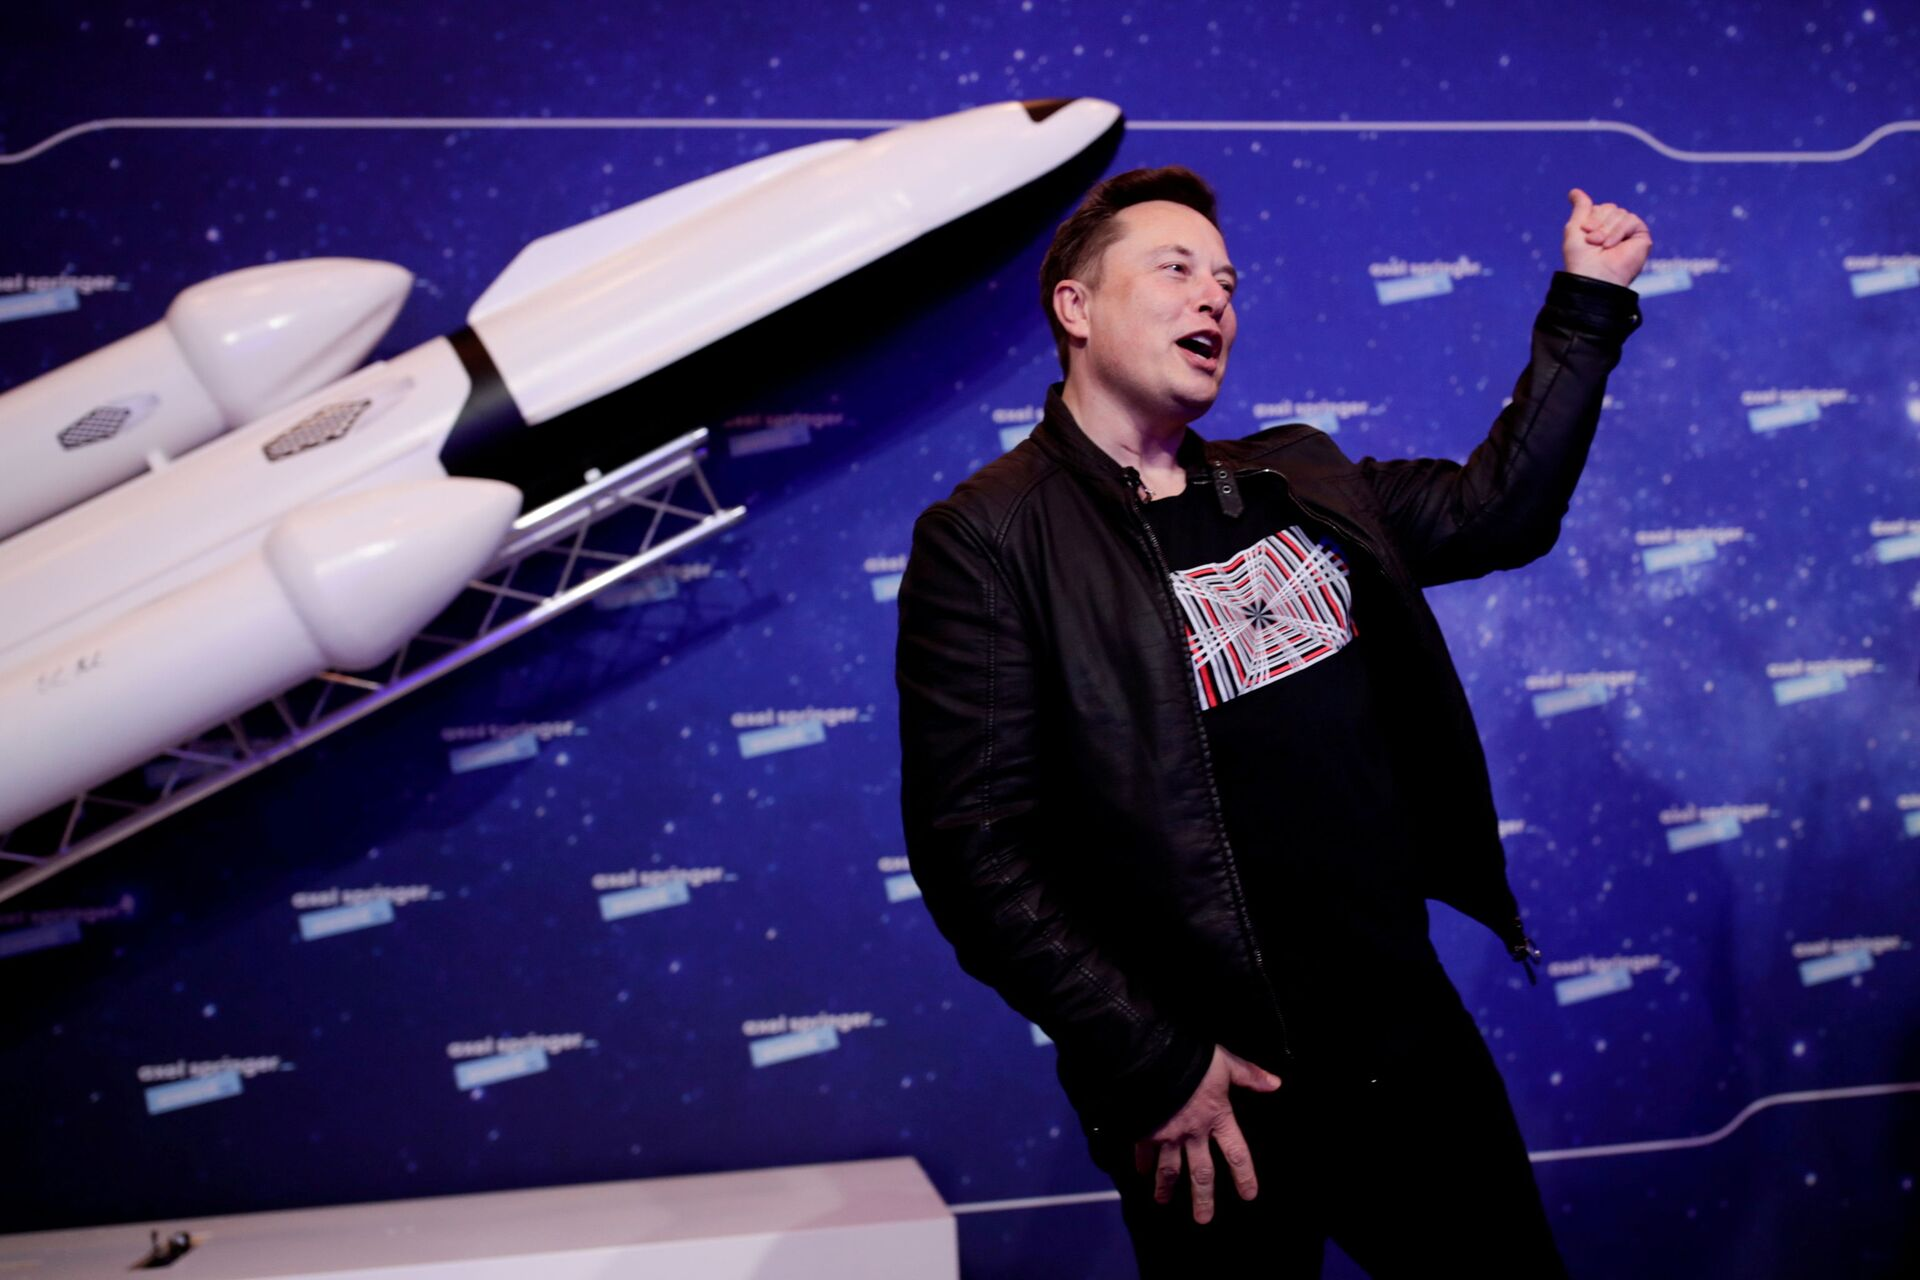 SpaceX owner and Tesla CEO Elon Musk gestures after arriving on the red carpet for the Axel Springer award, in Berlin, Germany, December 1, 2020. - Sputnik International, 1920, 07.09.2021